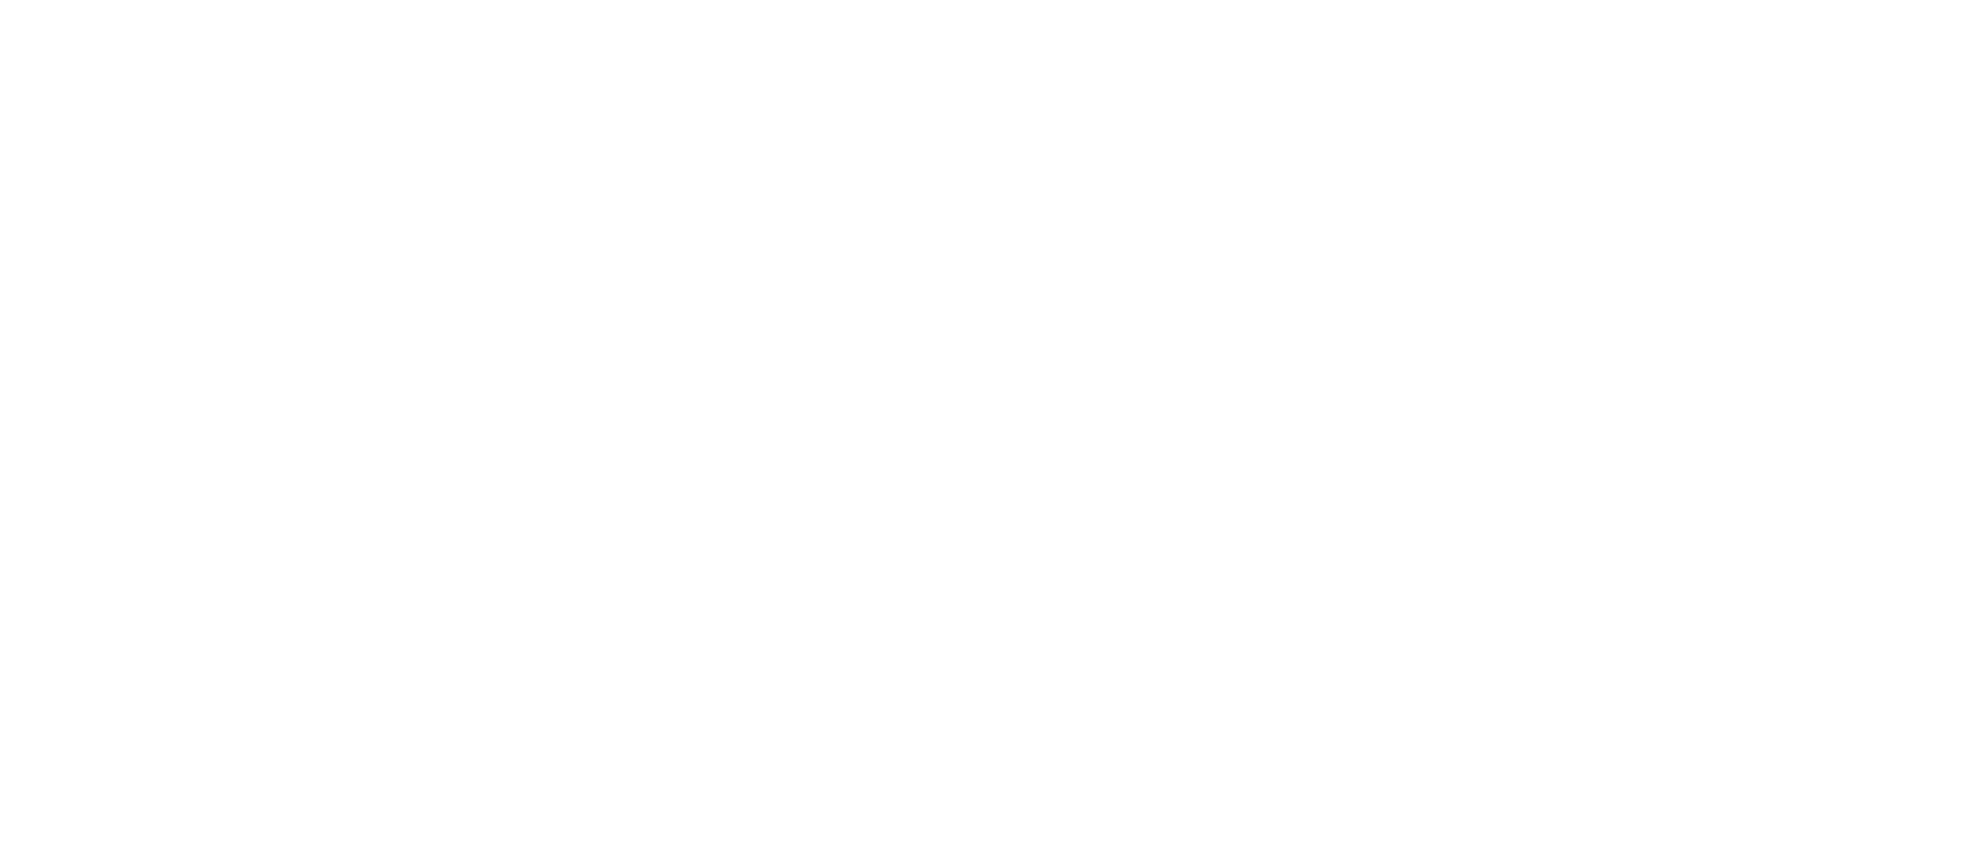 foglia bianca